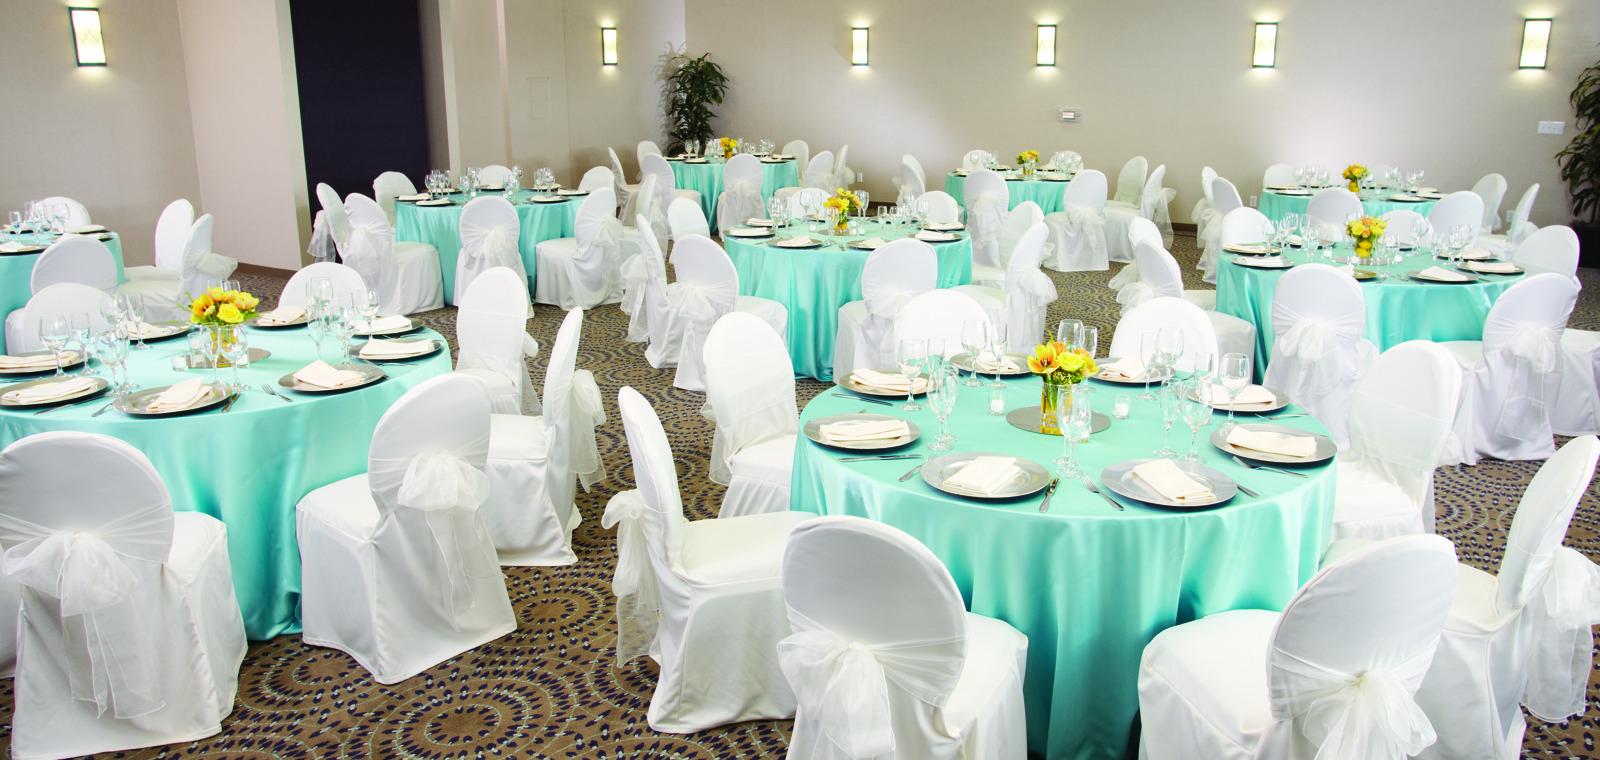 Waterfront Events Regatta Room Banquet DK0411